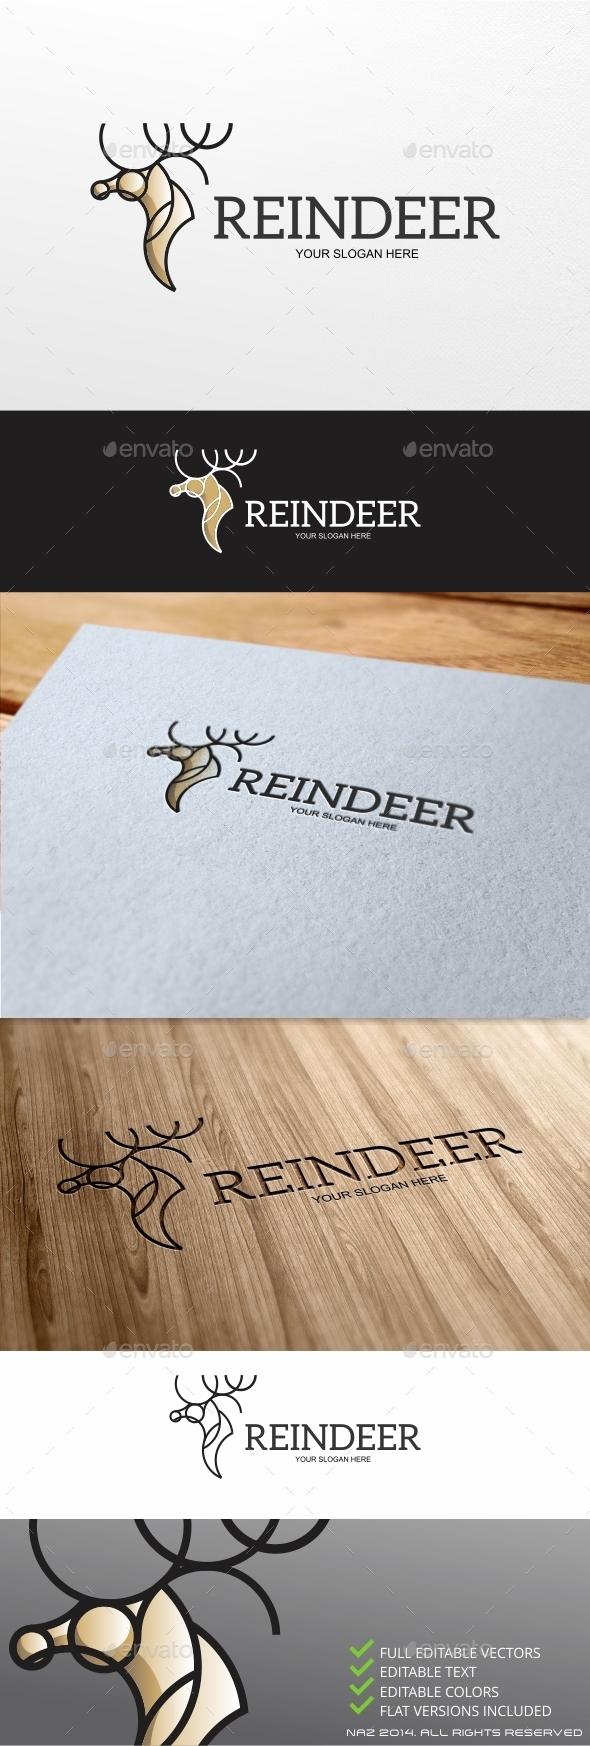 GraphicRiver Reindeer Logo 9411851